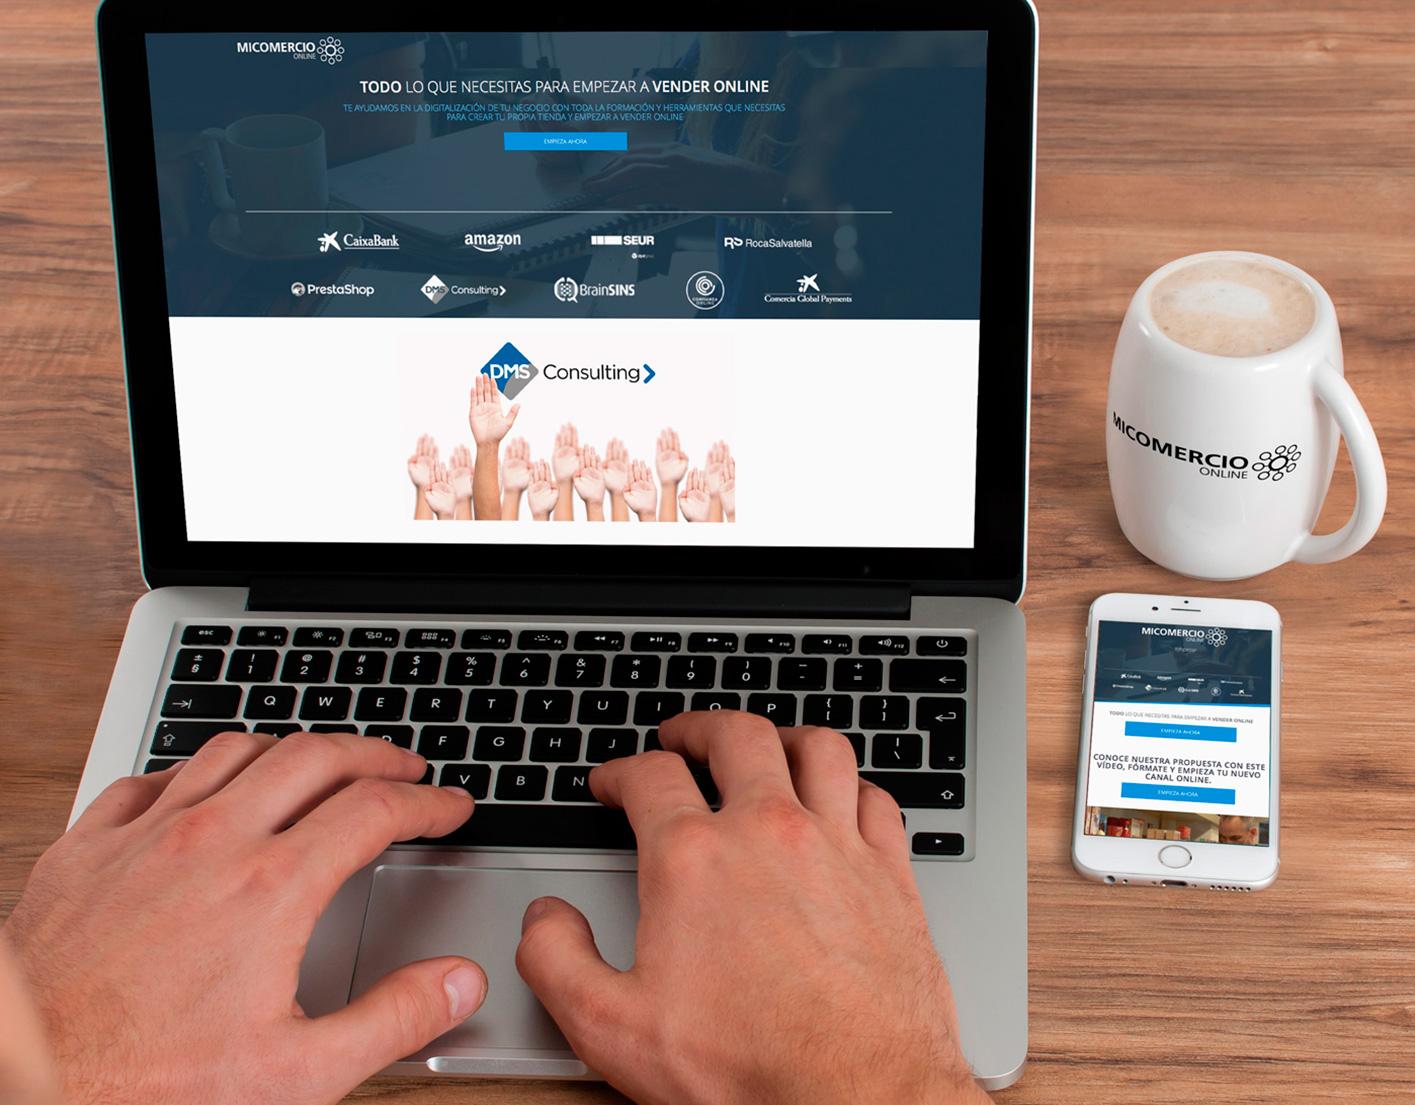 mi-comercio-online-dms